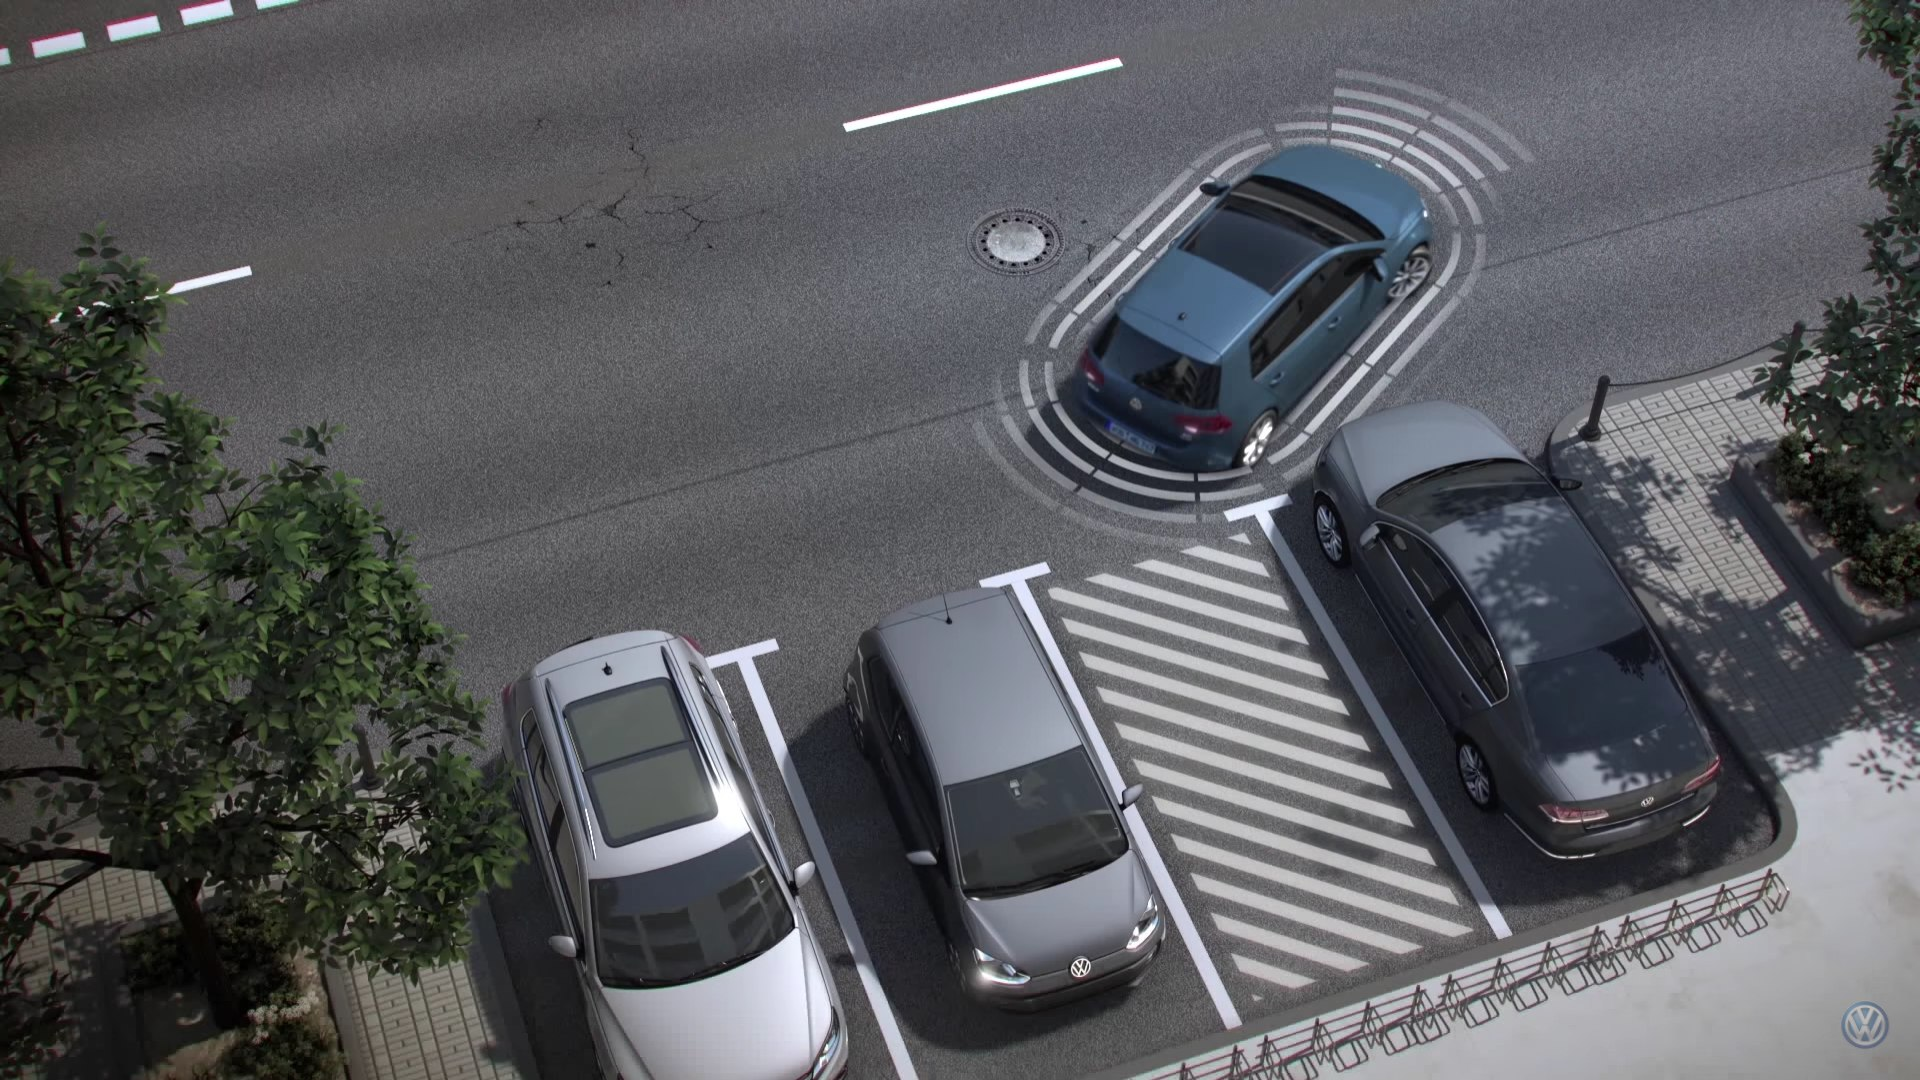 Parking Assistant System